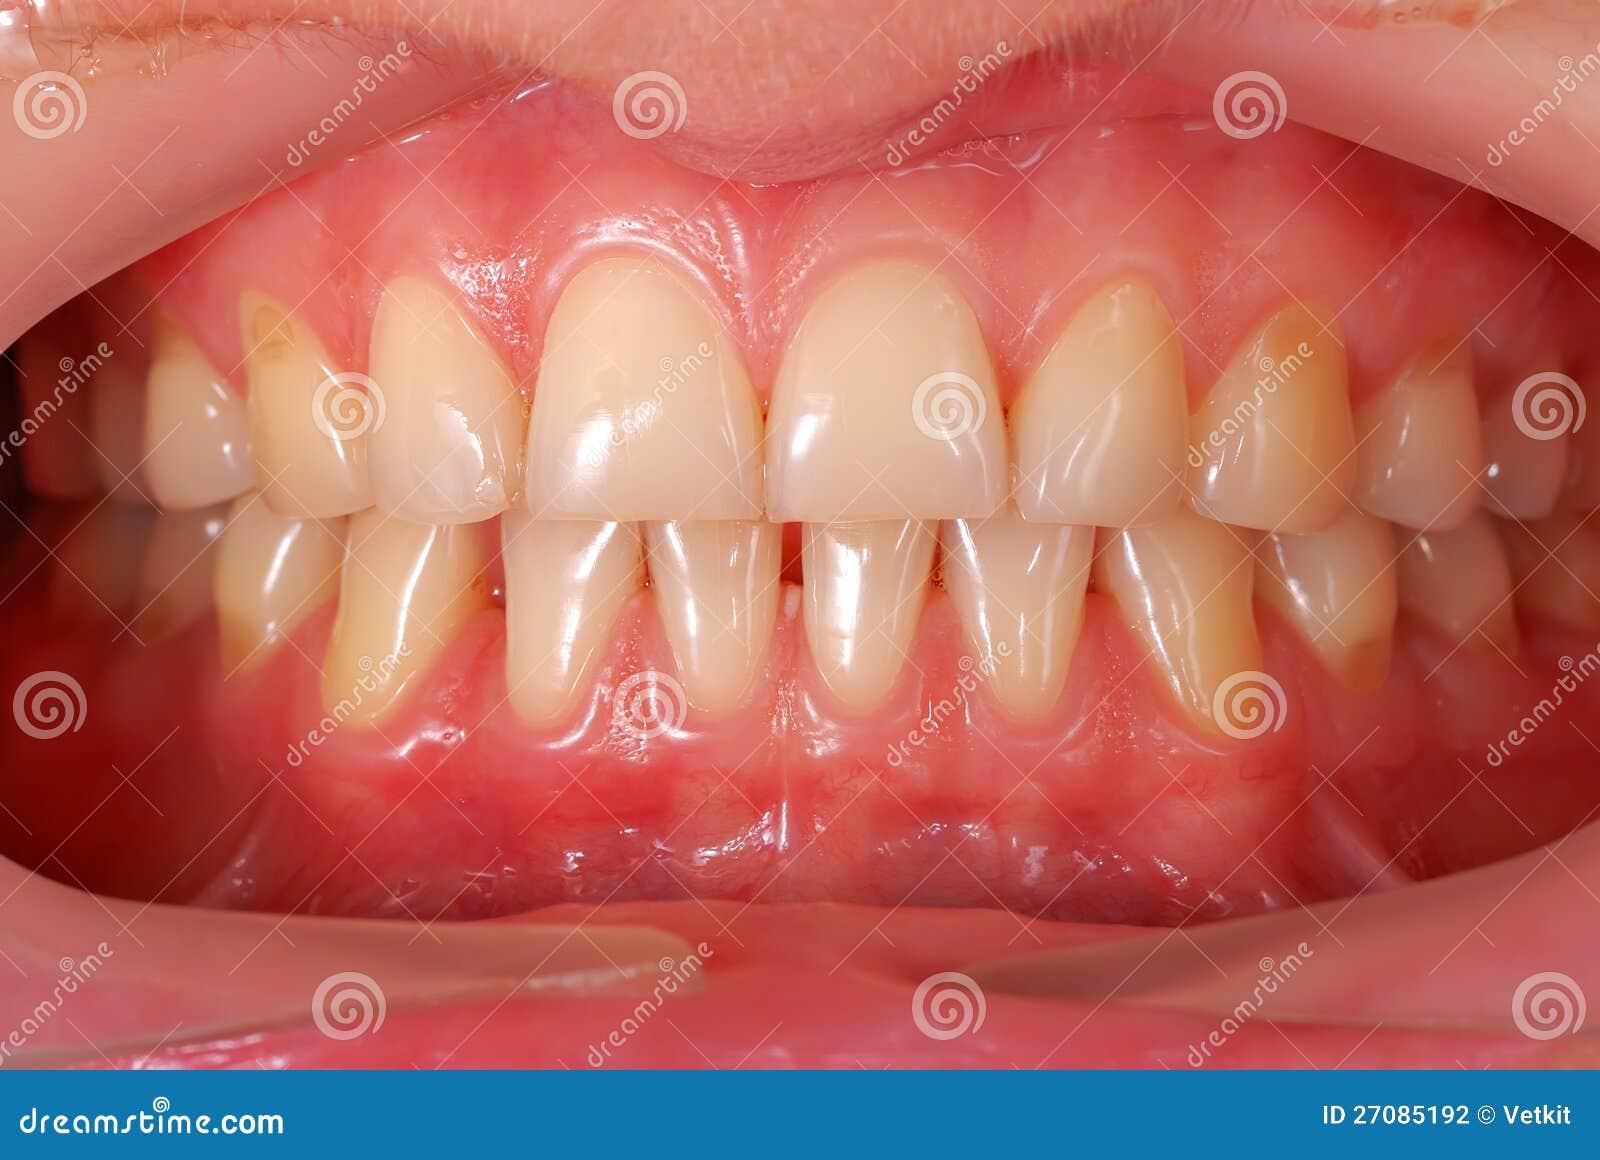 Human Teeth Stock Photography - Image: 27085192